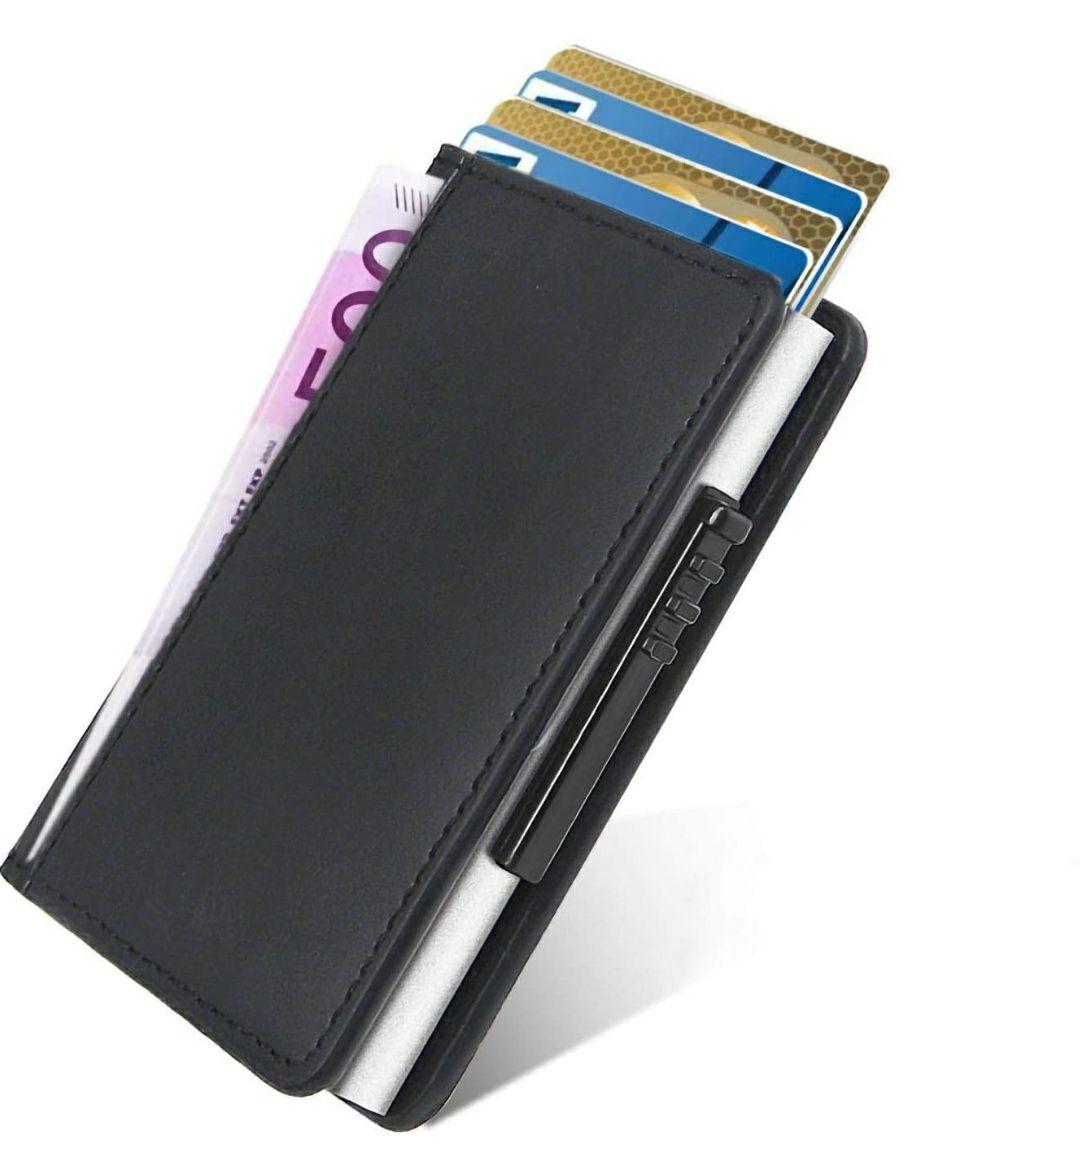 [Lightning deal] Creditcardhouder + RFID-blocker @Amazon.de (76% korting)